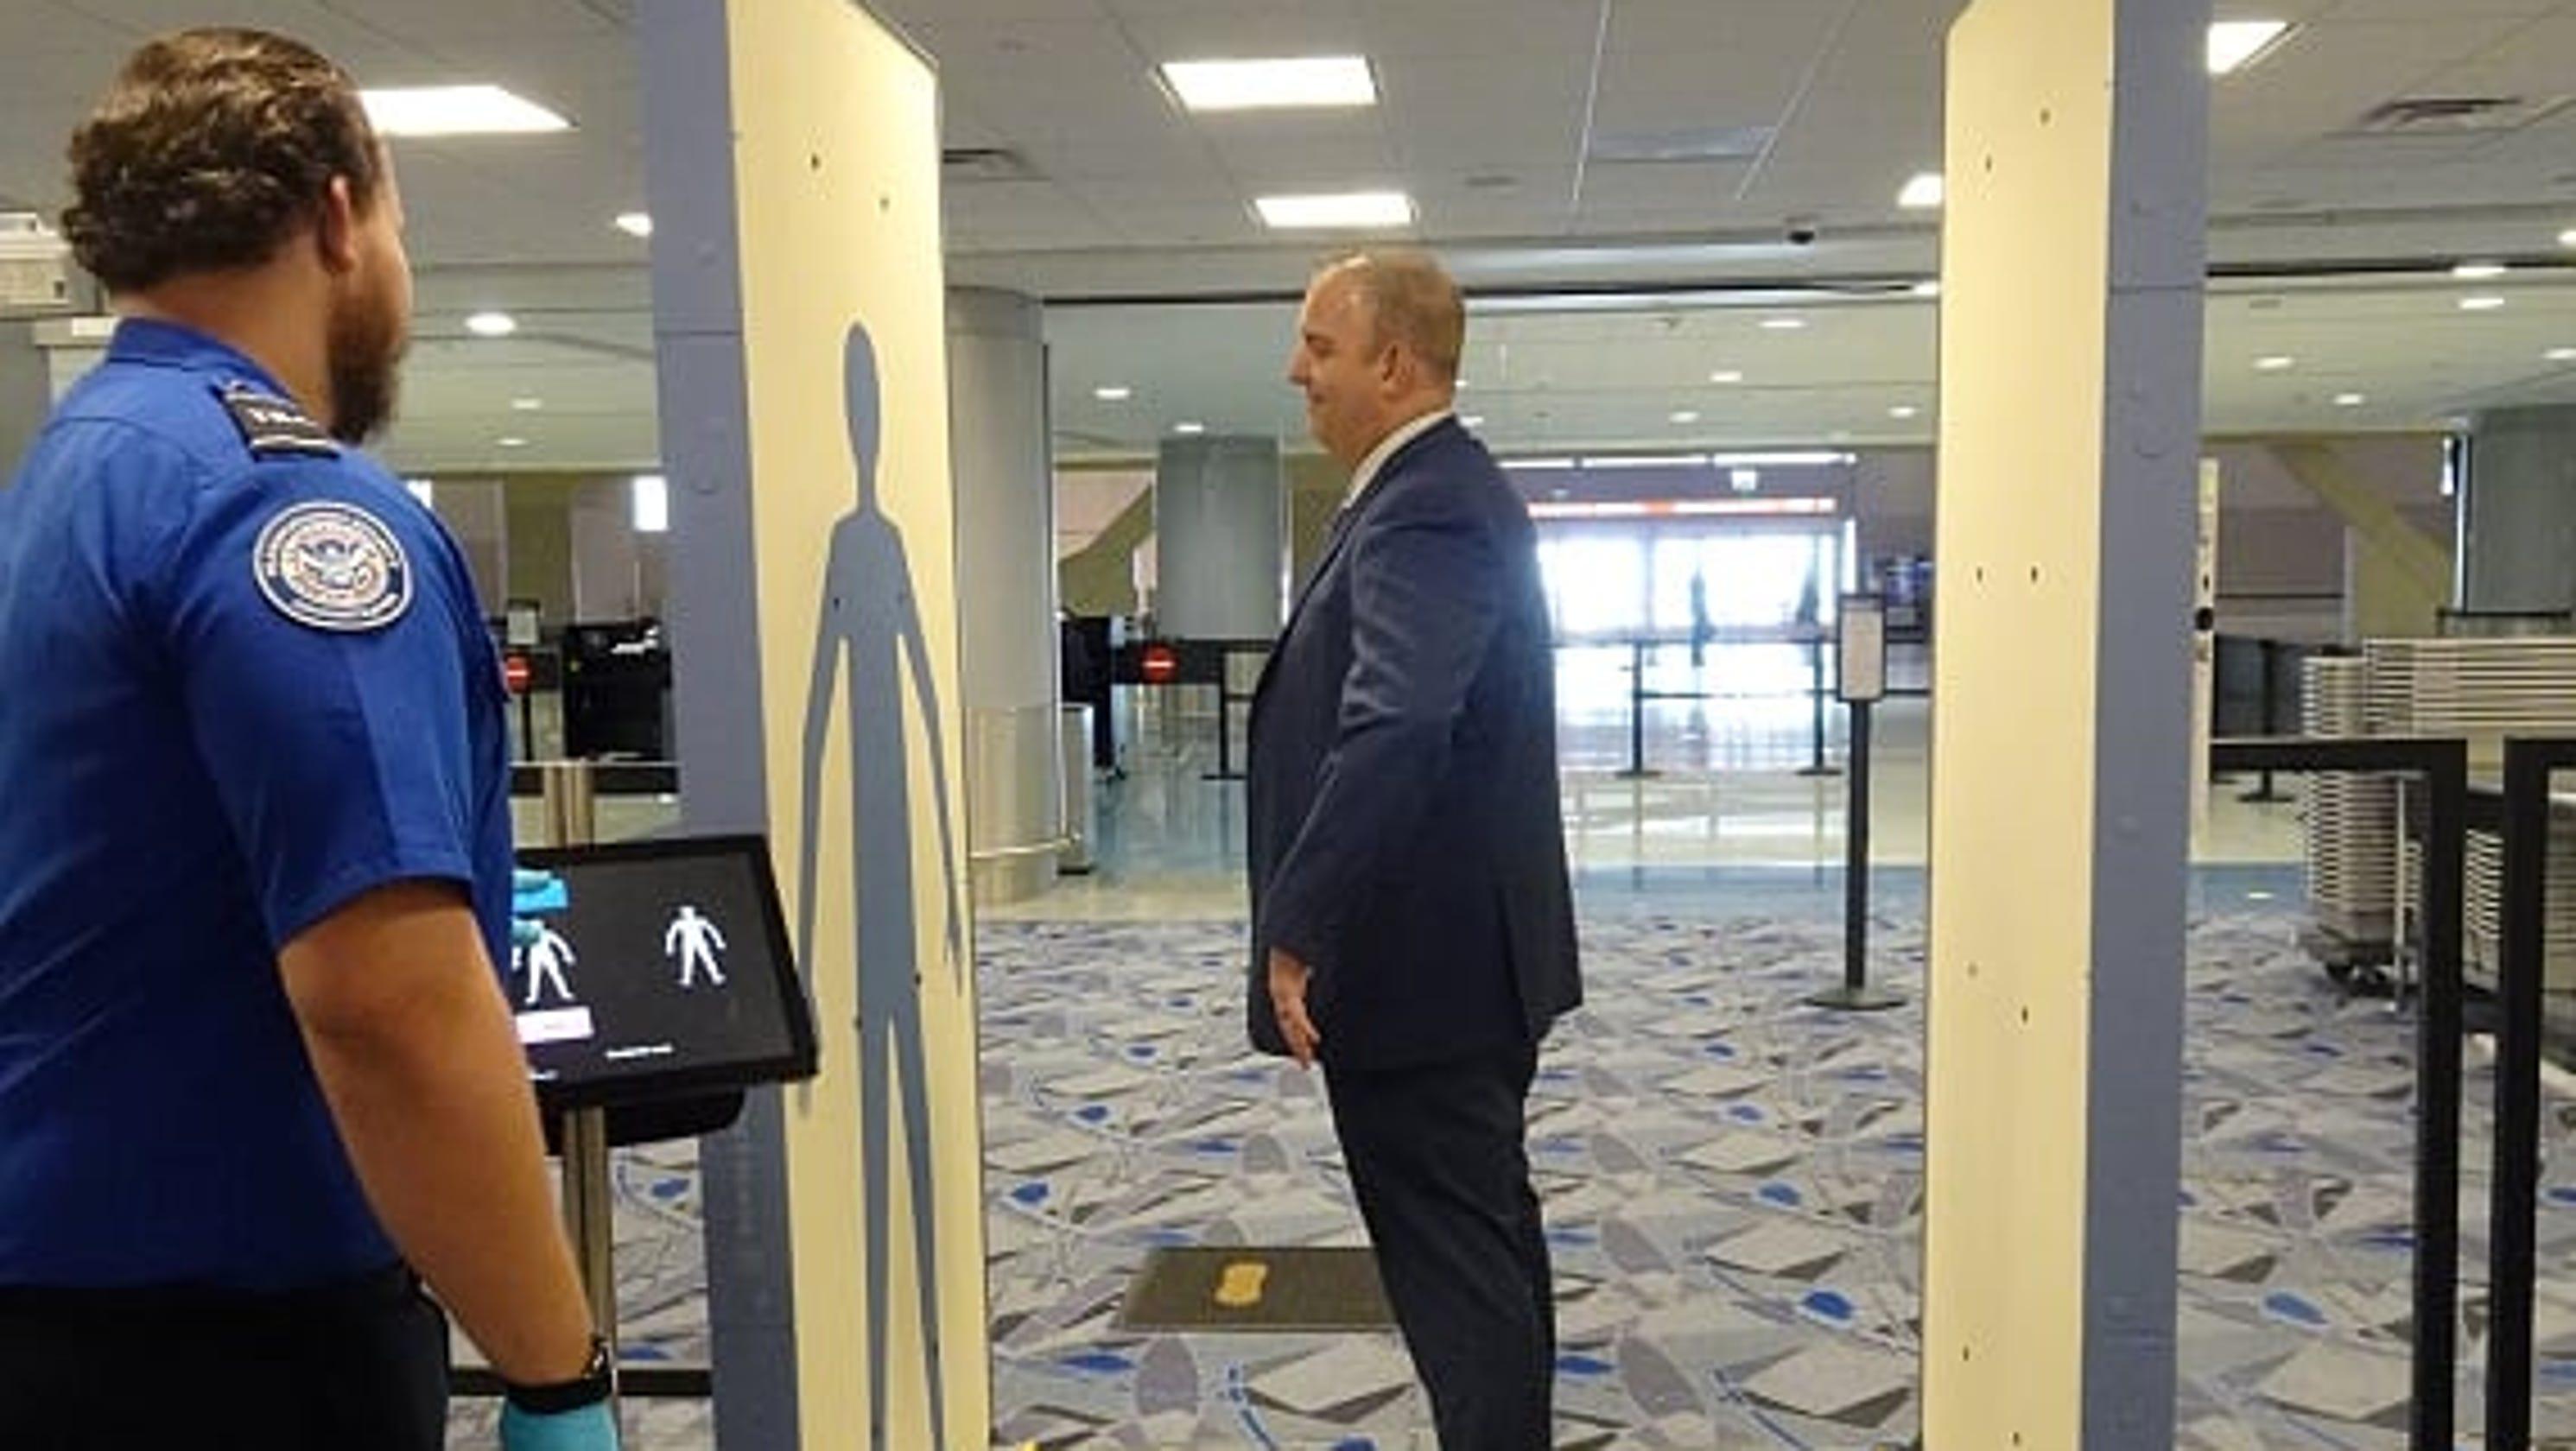 Kết quả hình ảnh cho TSA Sets Up 'Innovation Checkpoint' at Las Vegas Airport To Test Security Tech images